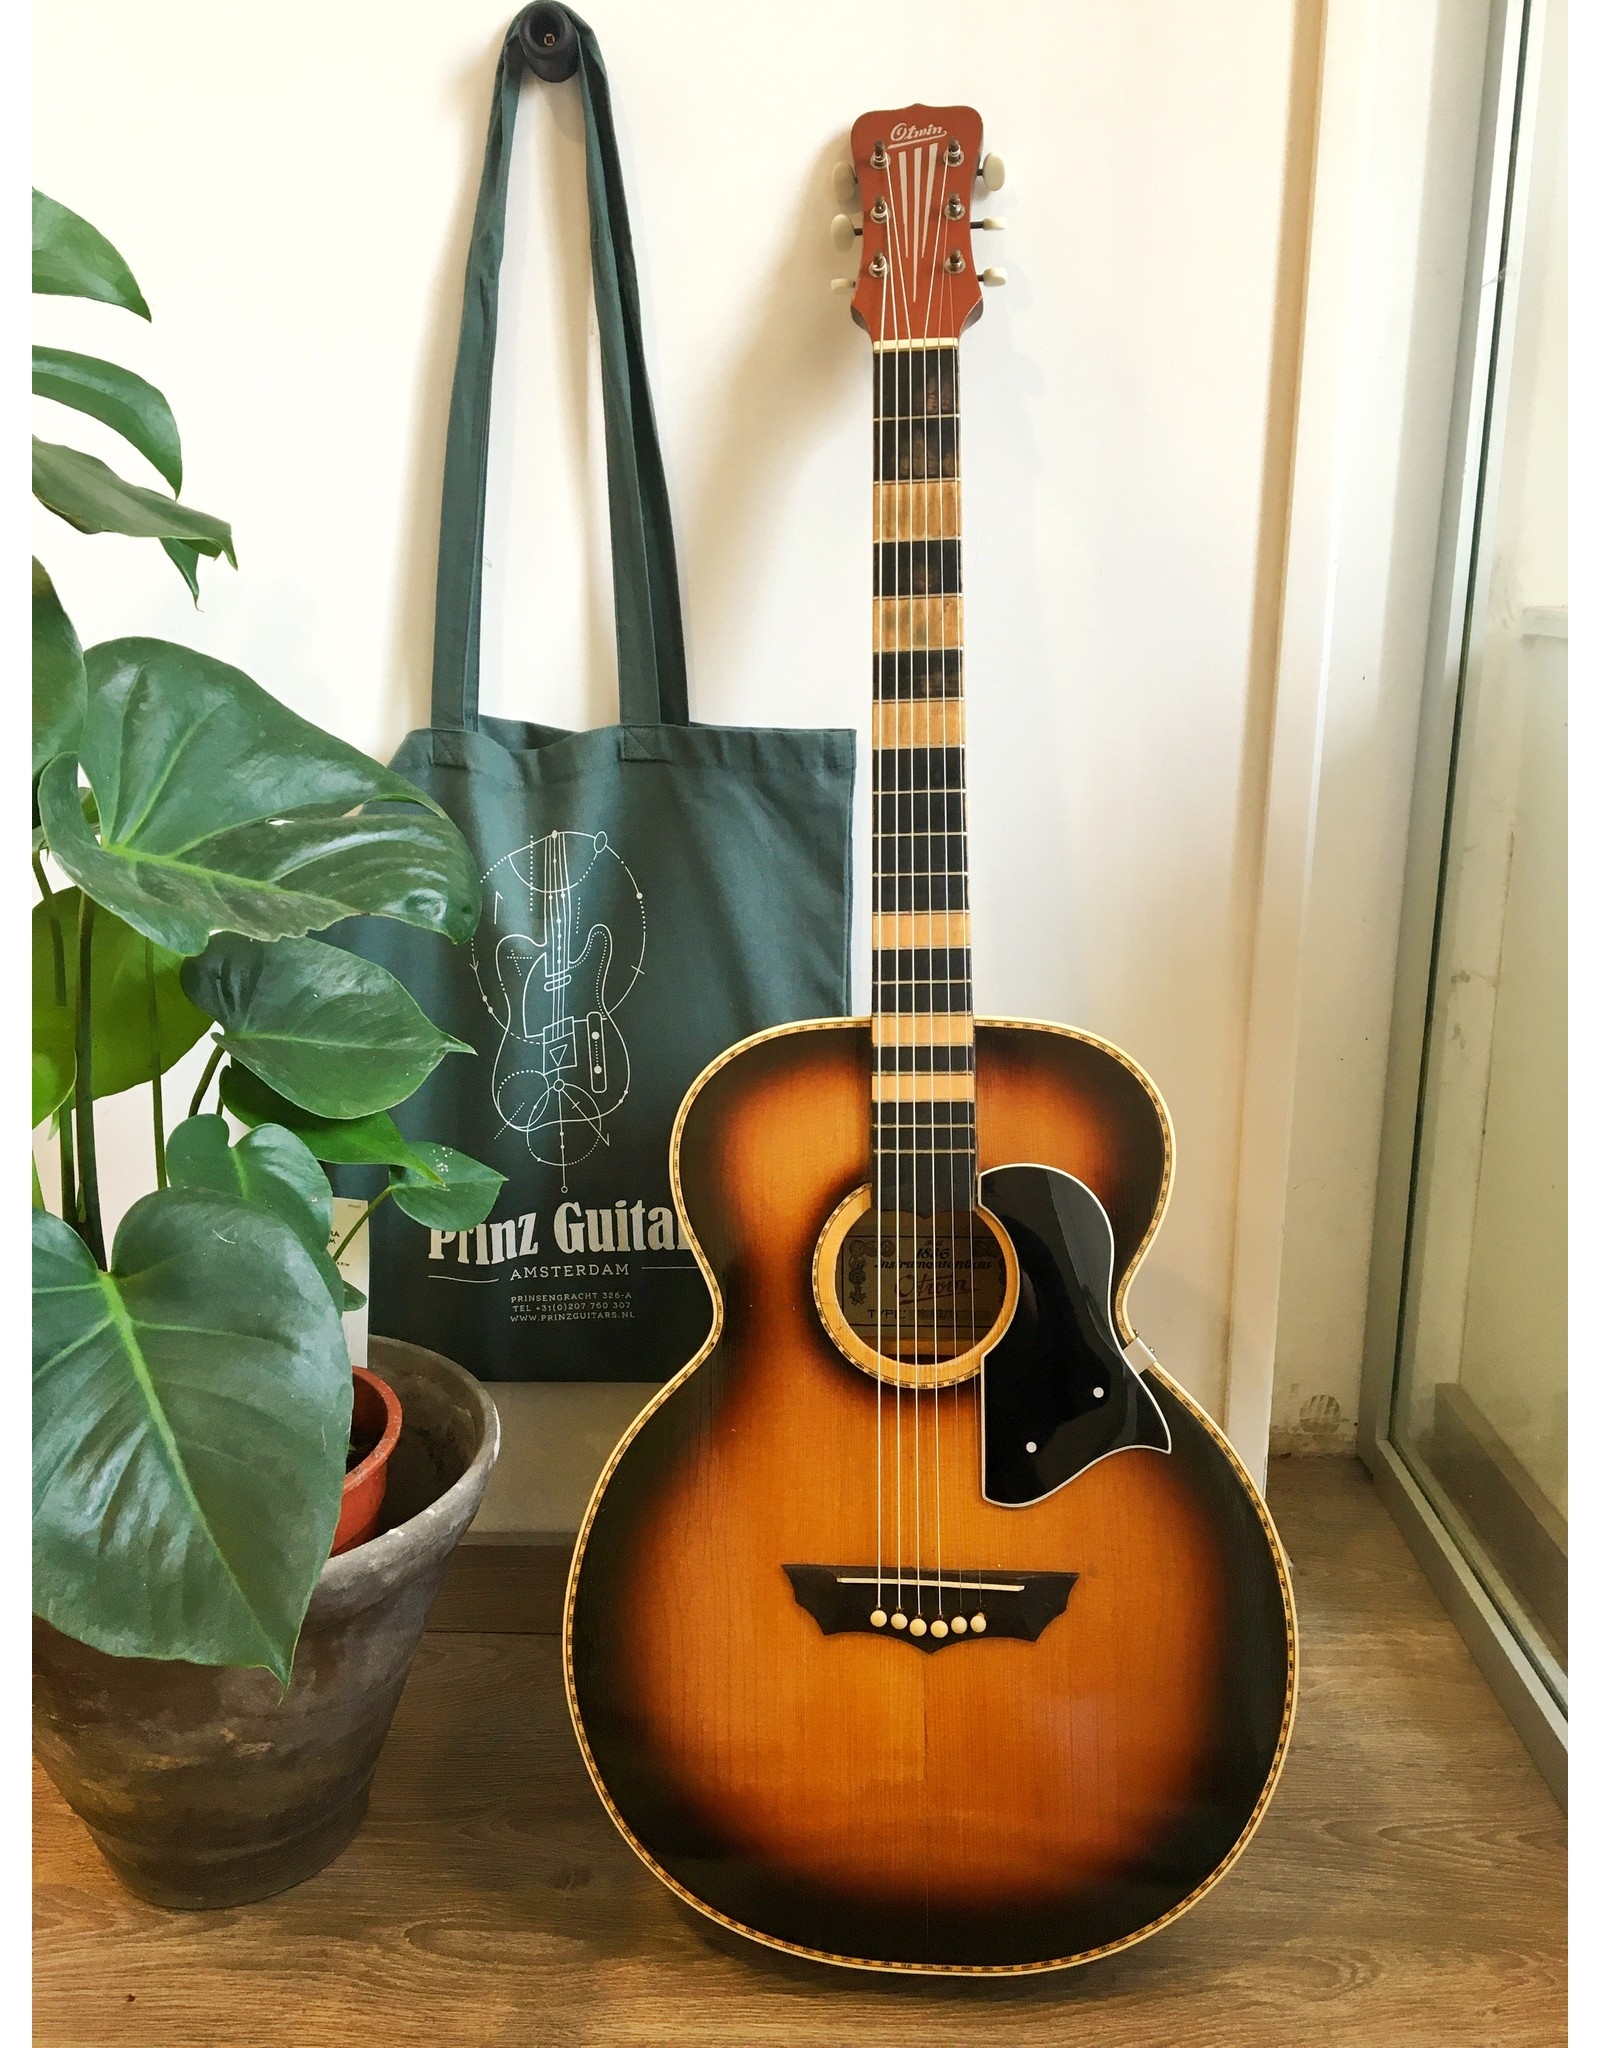 Otwin 83/15 late '50s parlor gitaar